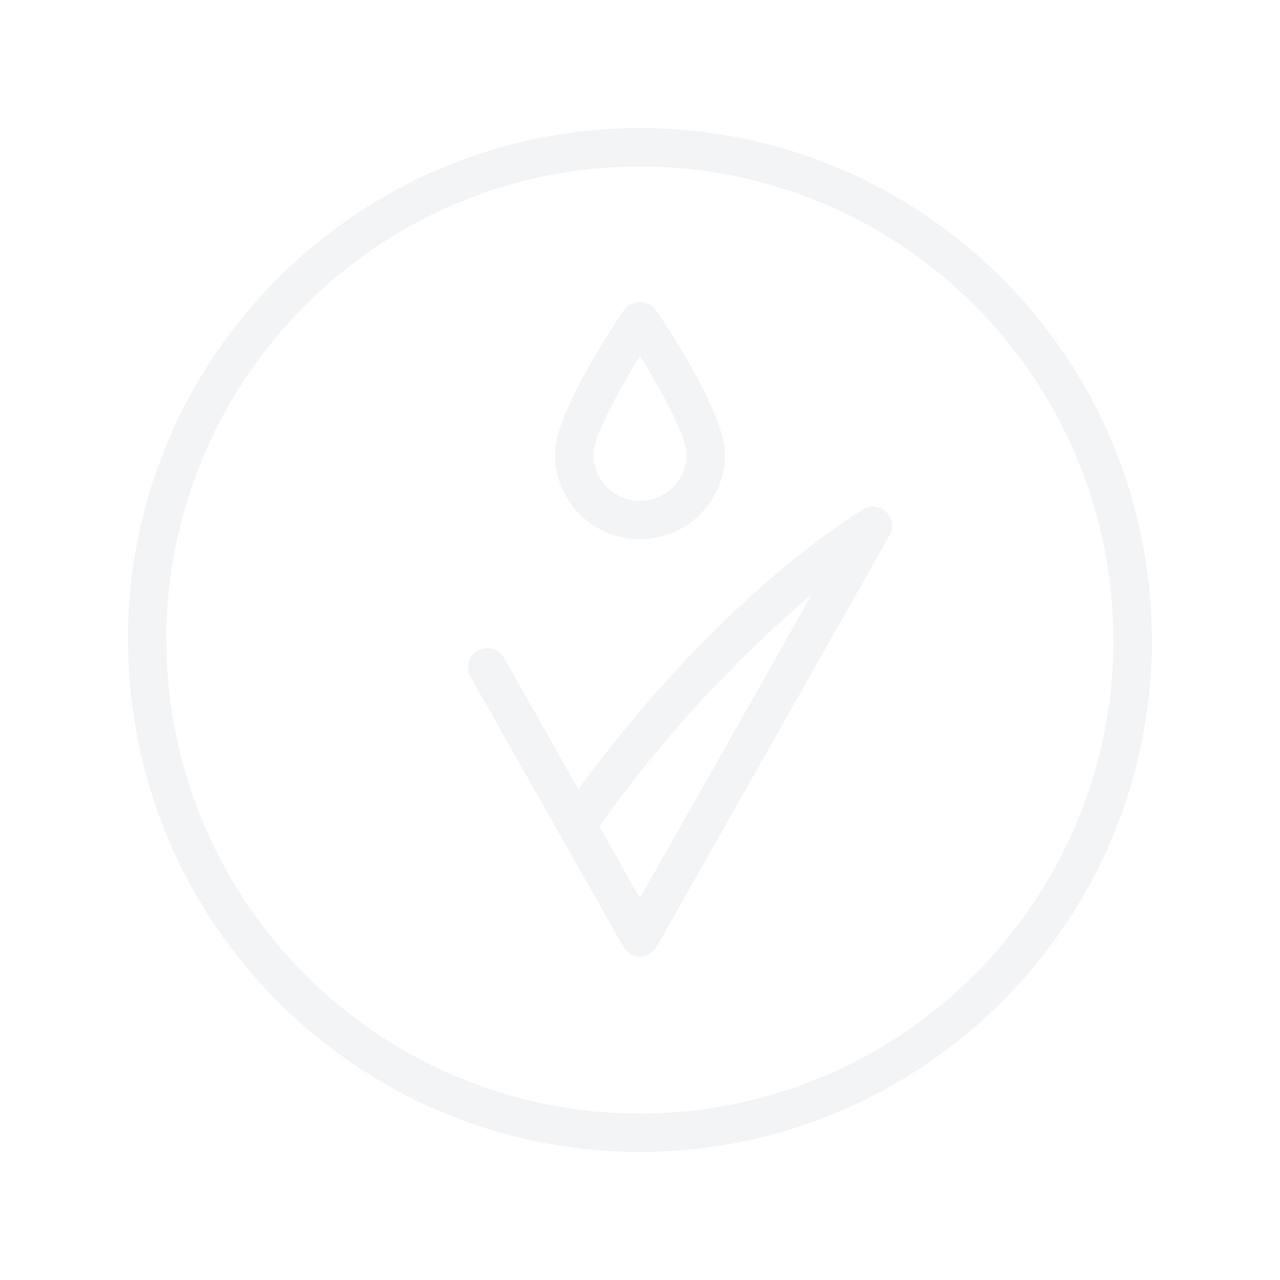 L'OREAL PROFESSIONNEL Absolut Repair Lipidium Shampoo 1500ml